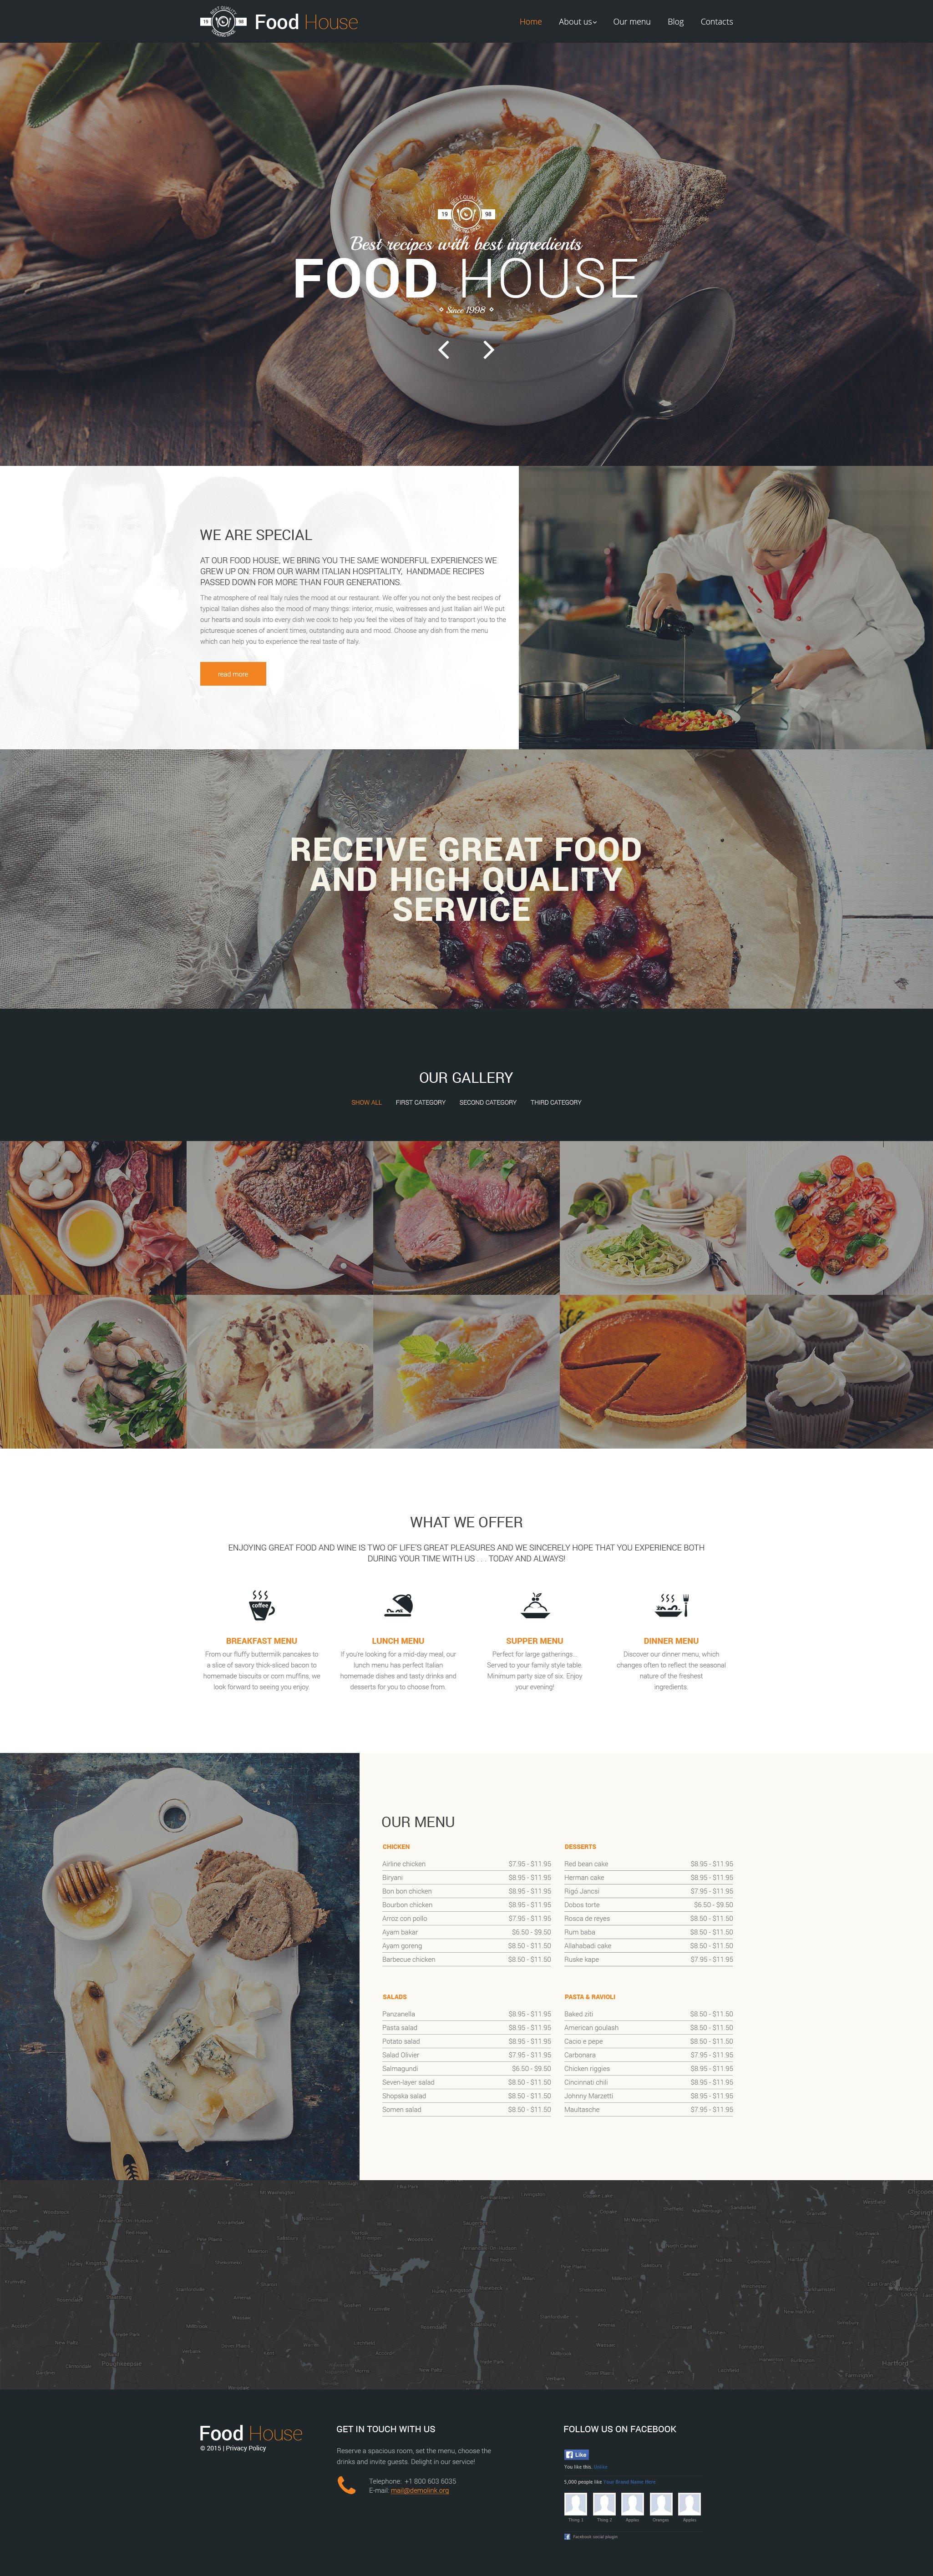 Responsive Food House Drupal #57611